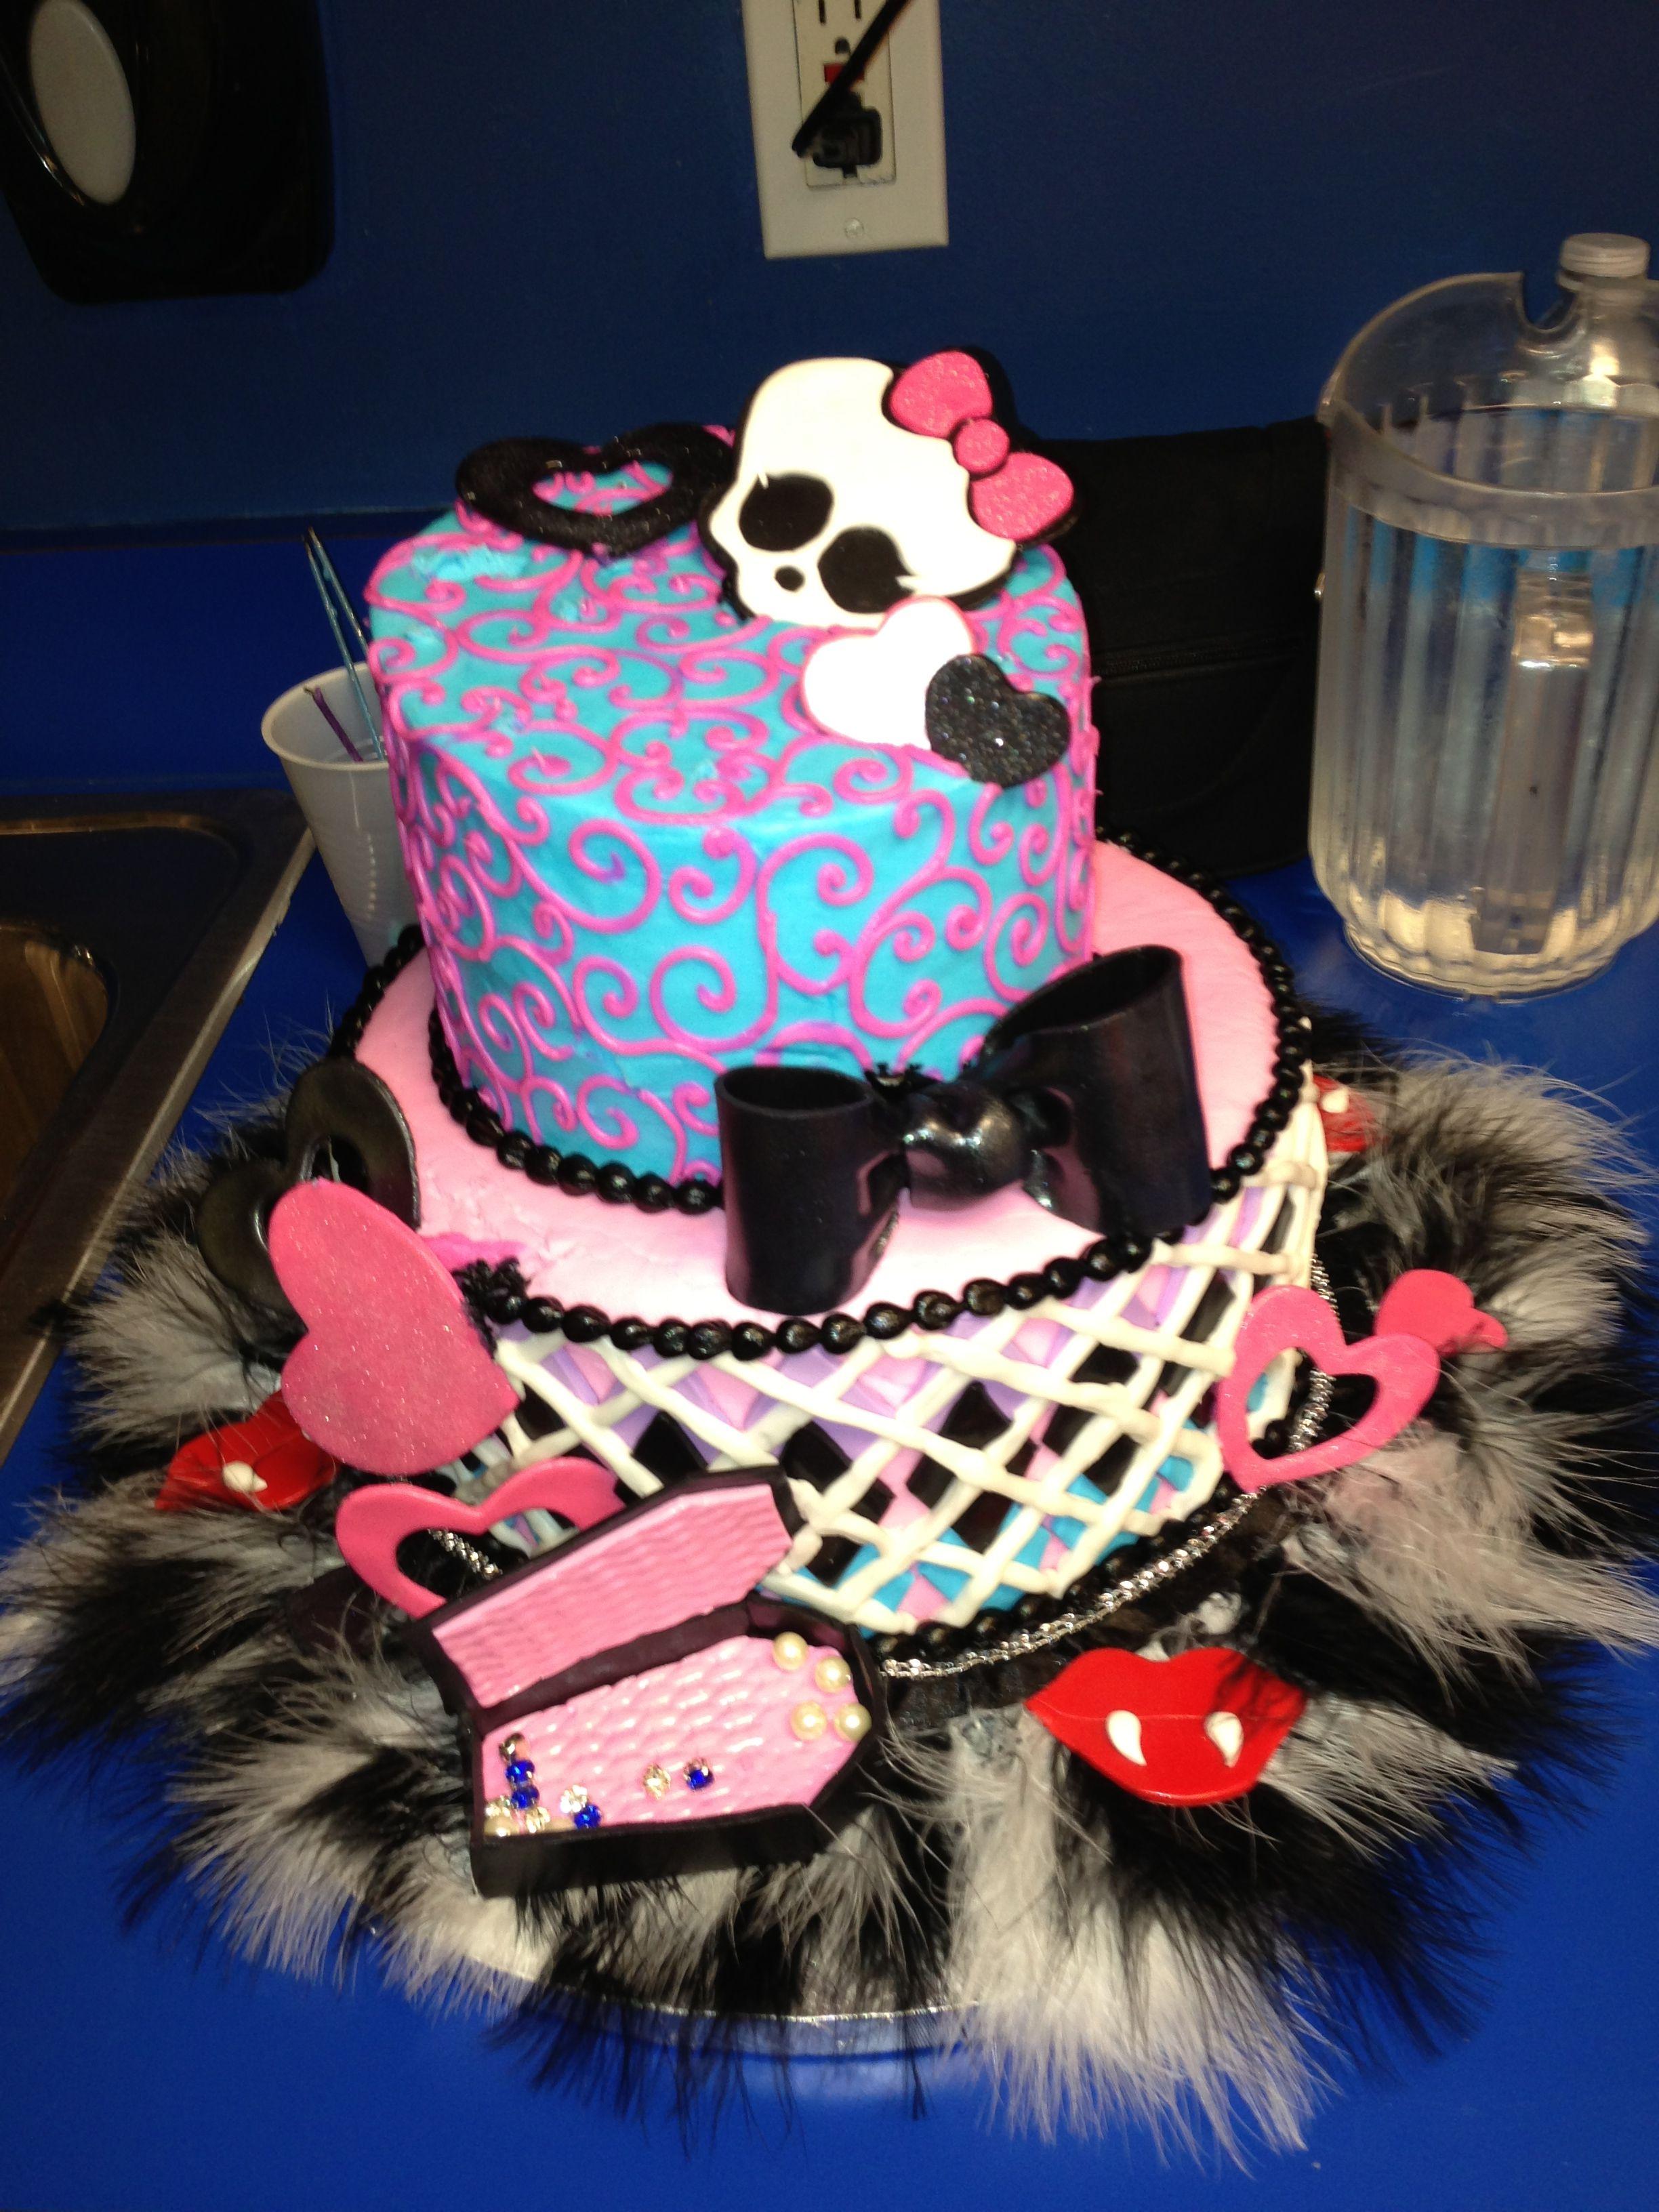 Bailee's 9th birthday cake